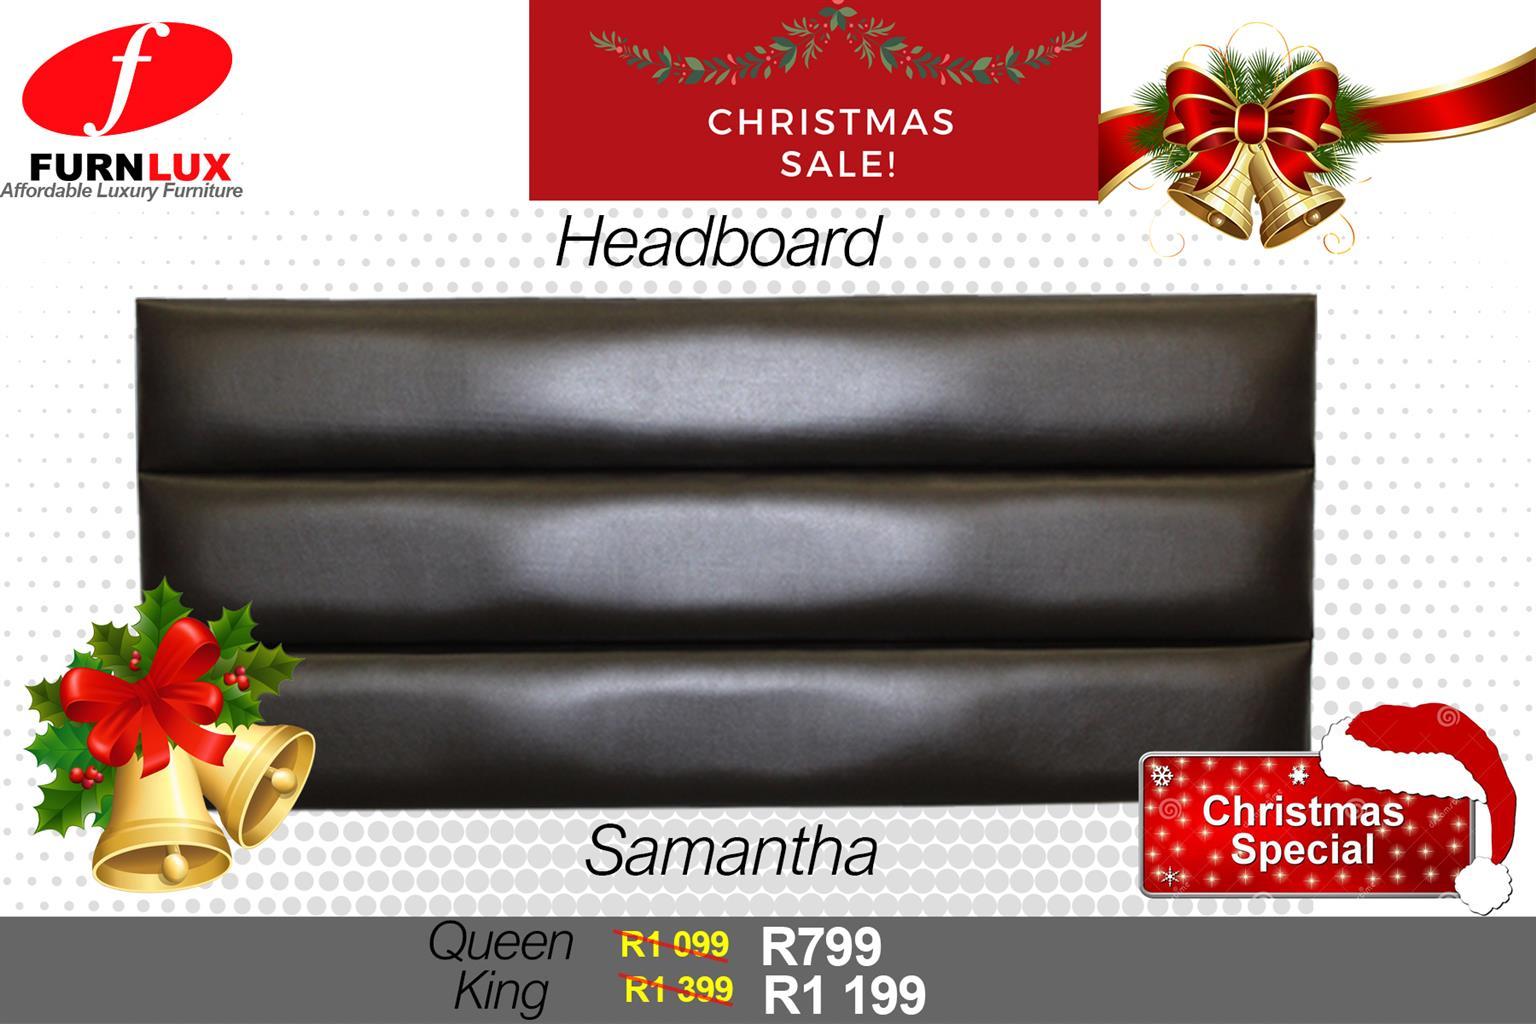 CHRISTMAS SPECIAL BRAND NEW HEADBOARD SAMANTHA